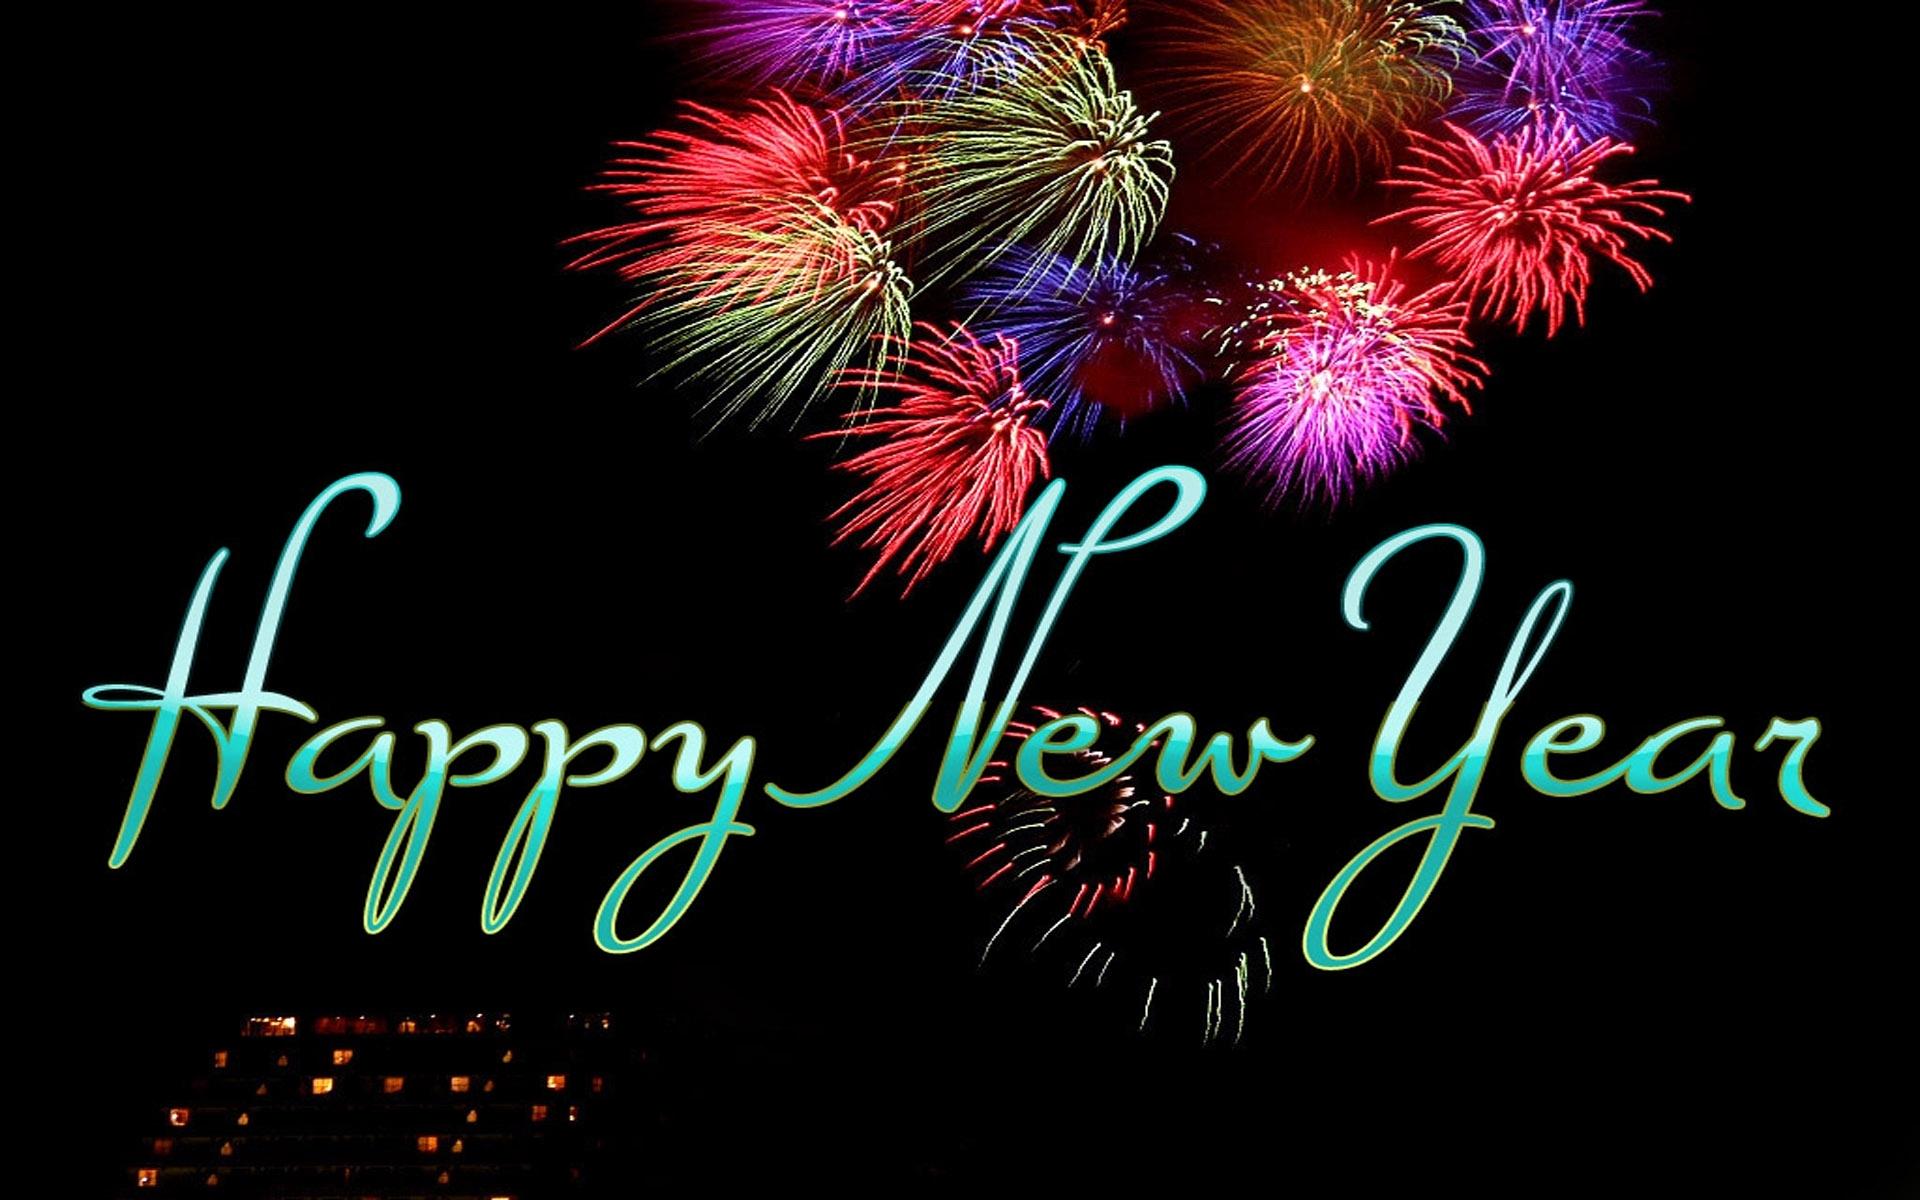 happy new year desktop background - media file   pixelstalk